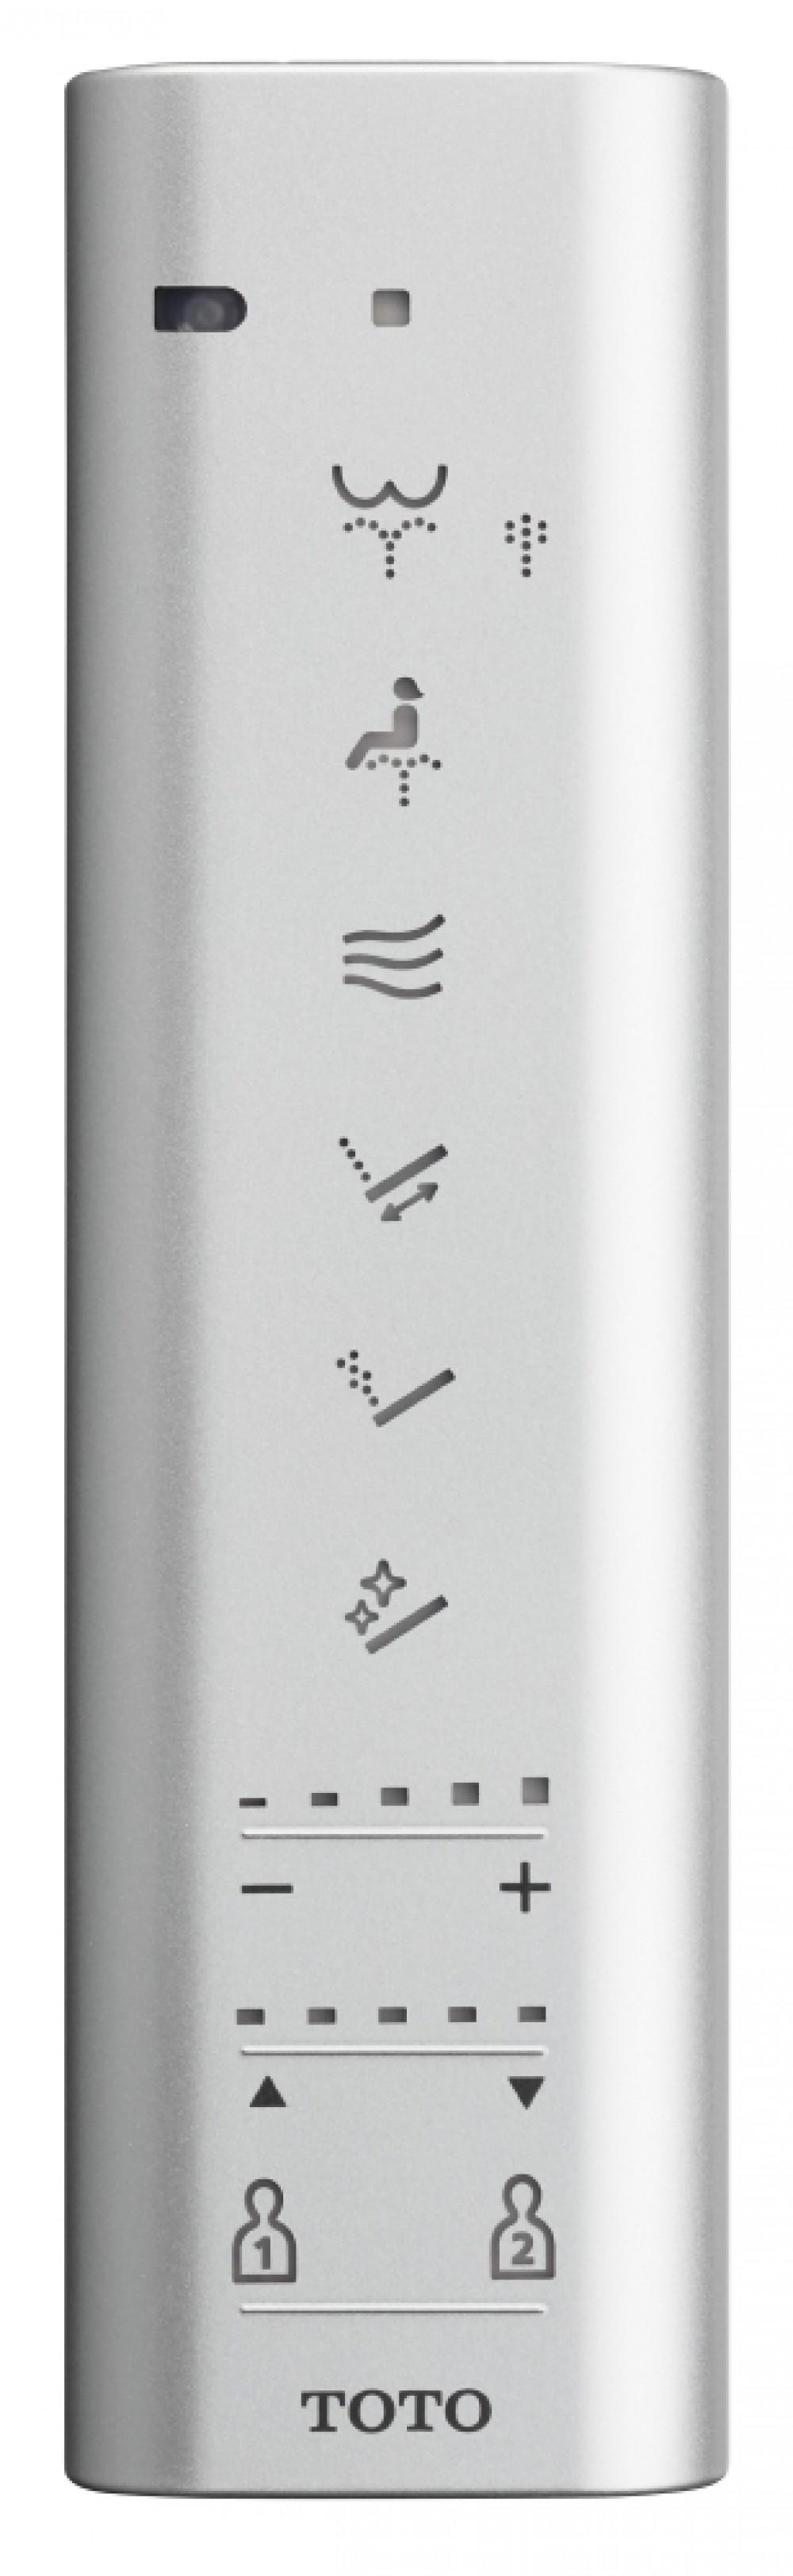 washlet rw toto auto flush remote control